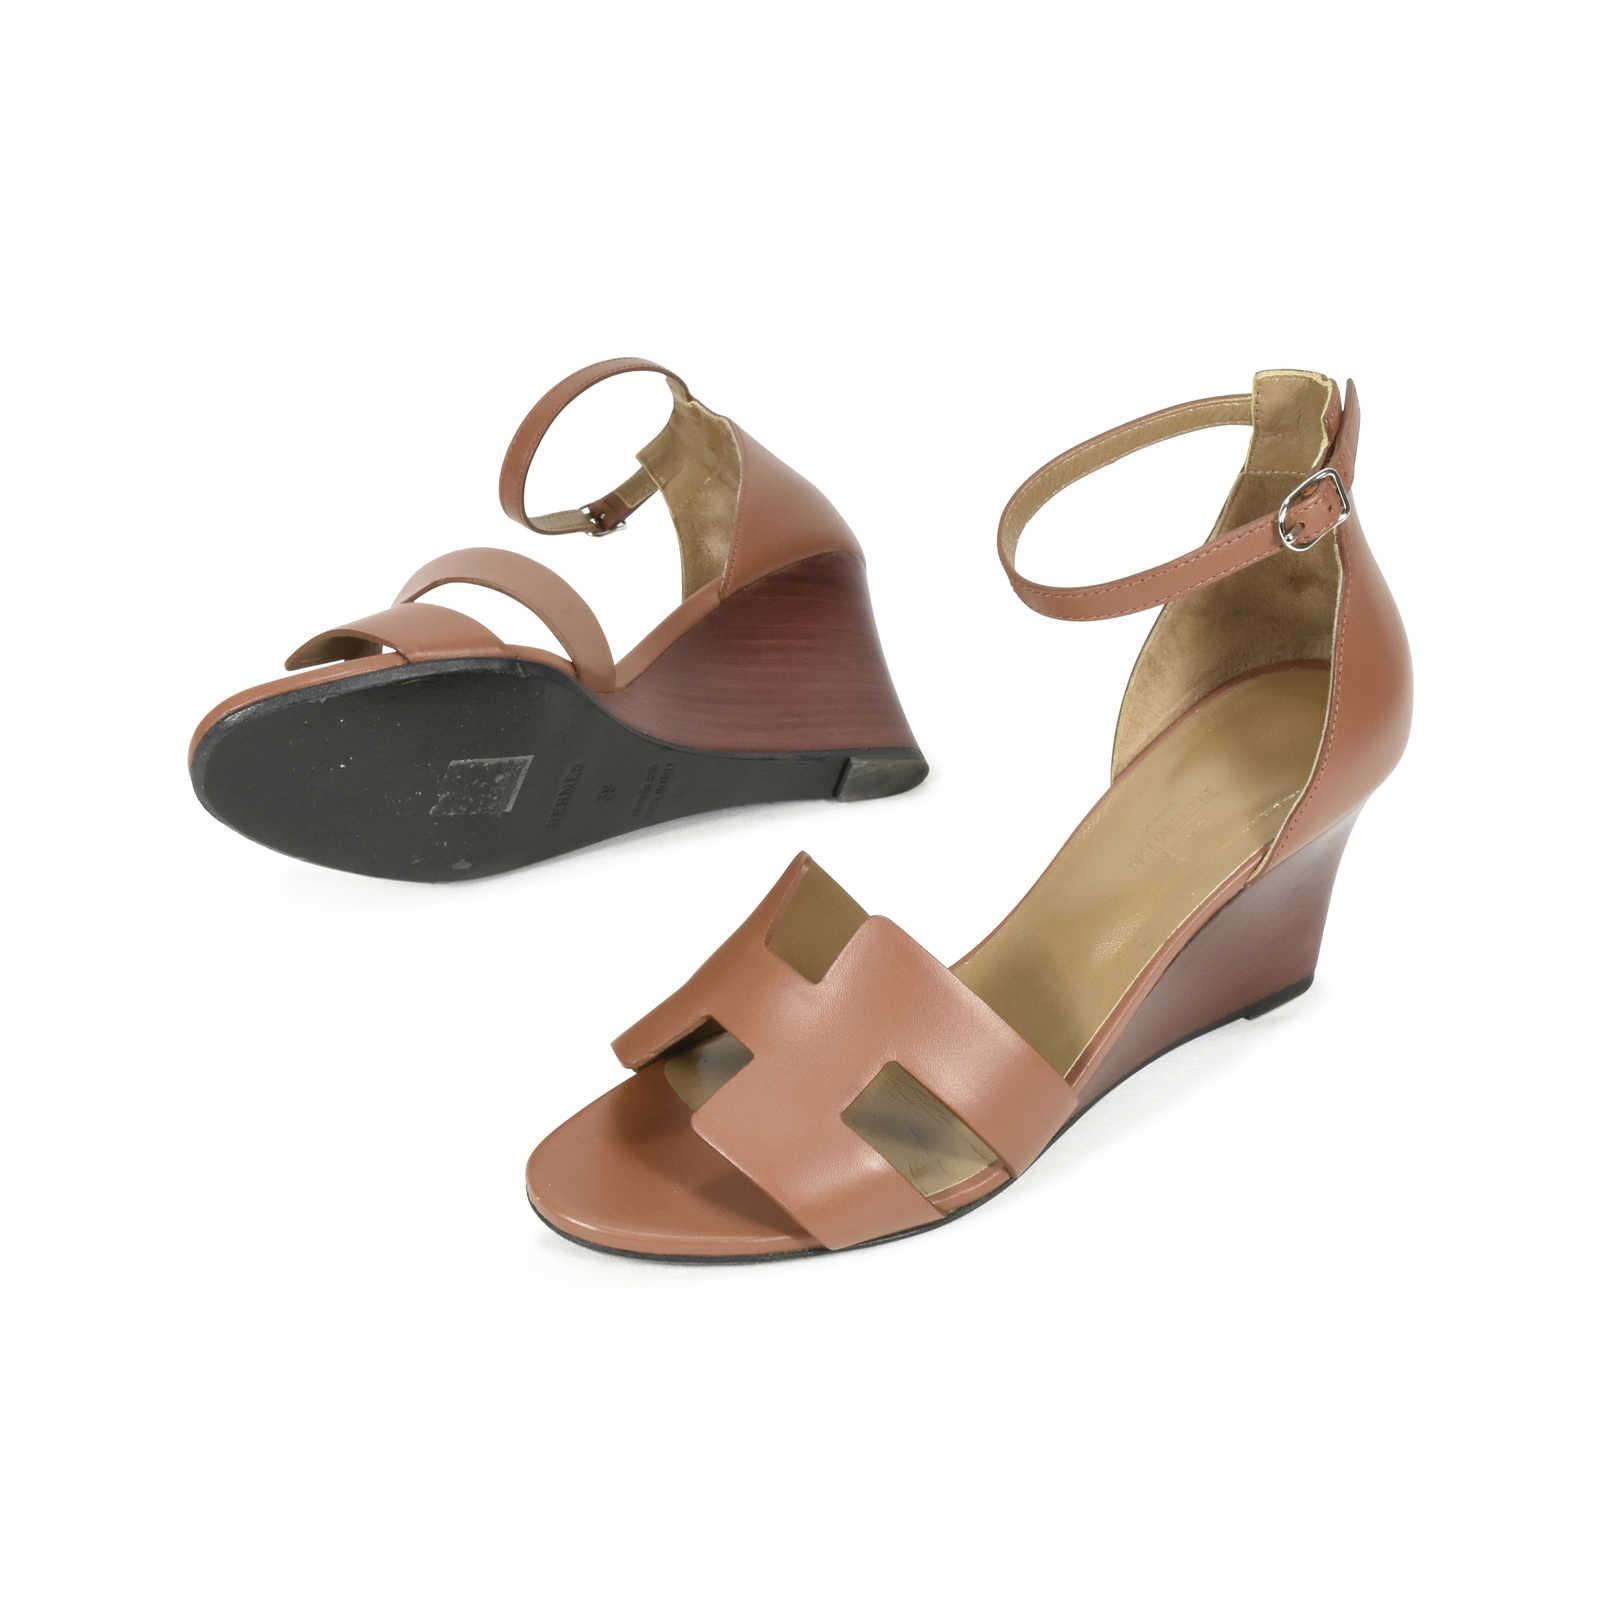 5dbff7ade77c ... Authentic Second Hand Hermès Legend Wedge Sandals (PSS-051-00179) -  Thumbnail ...